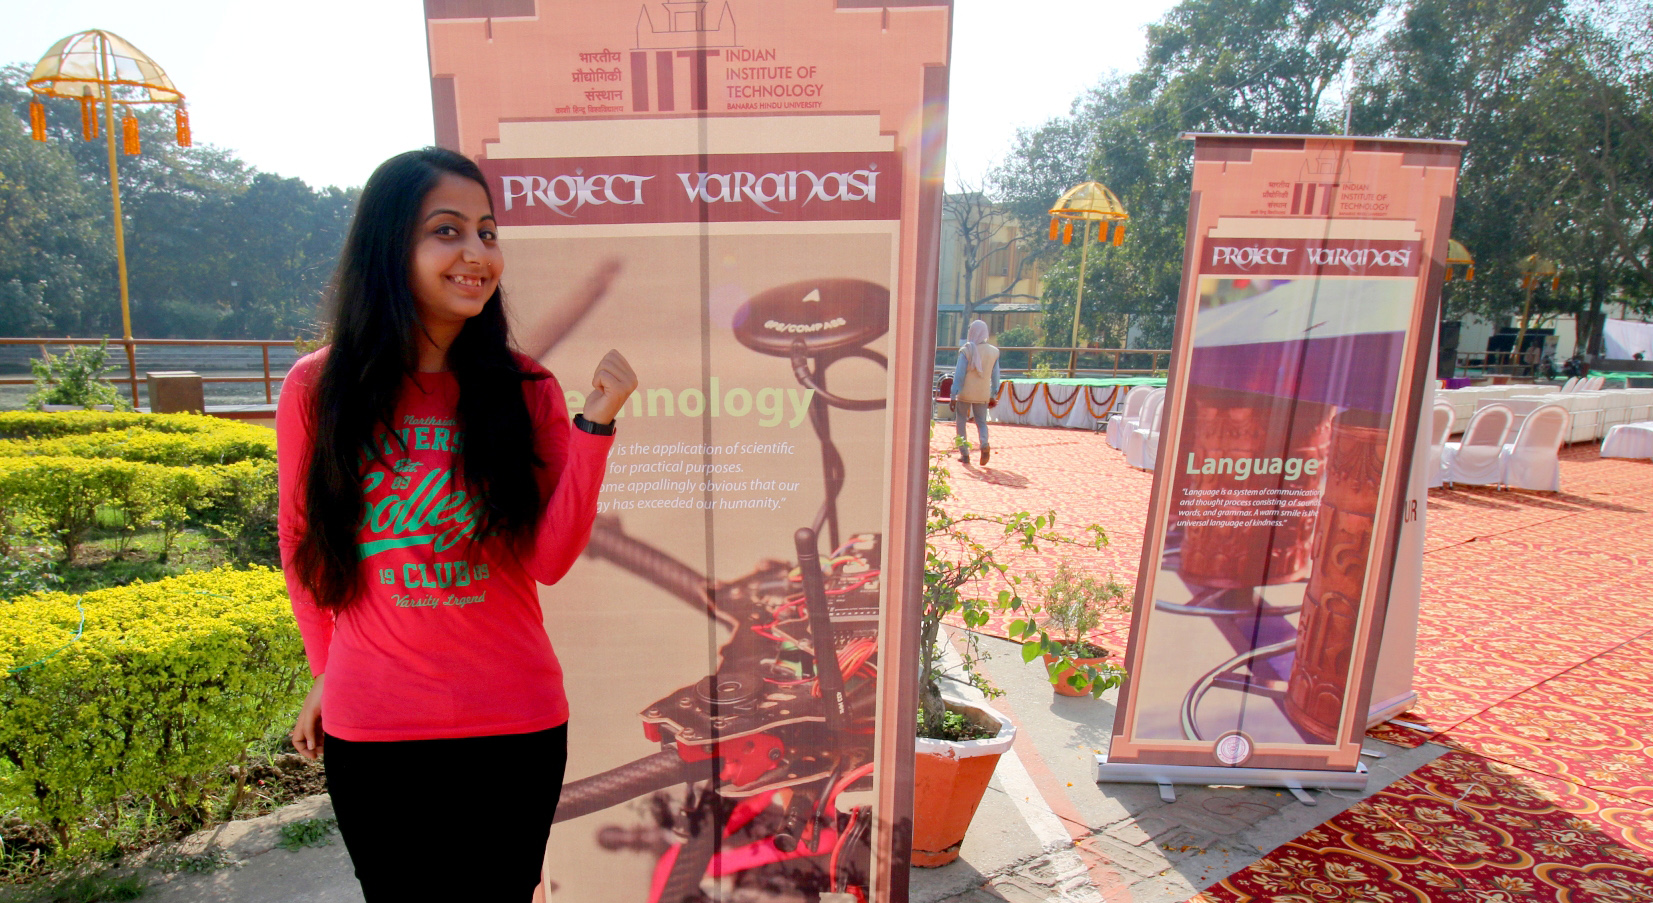 Project Varanasi Standy